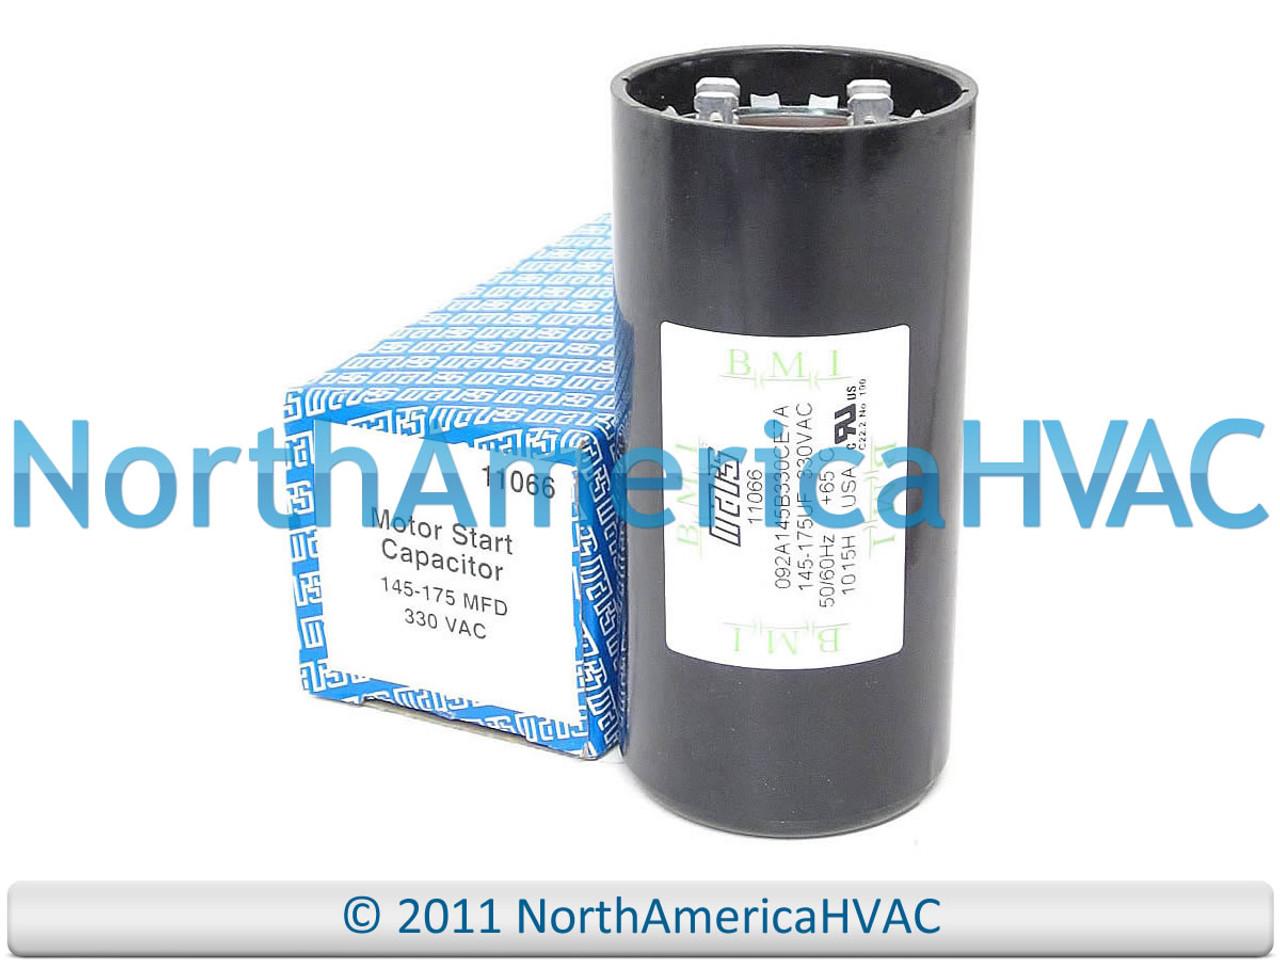 11966 145-174 MFD X 330 VAC Motor Start Capacitor JARD